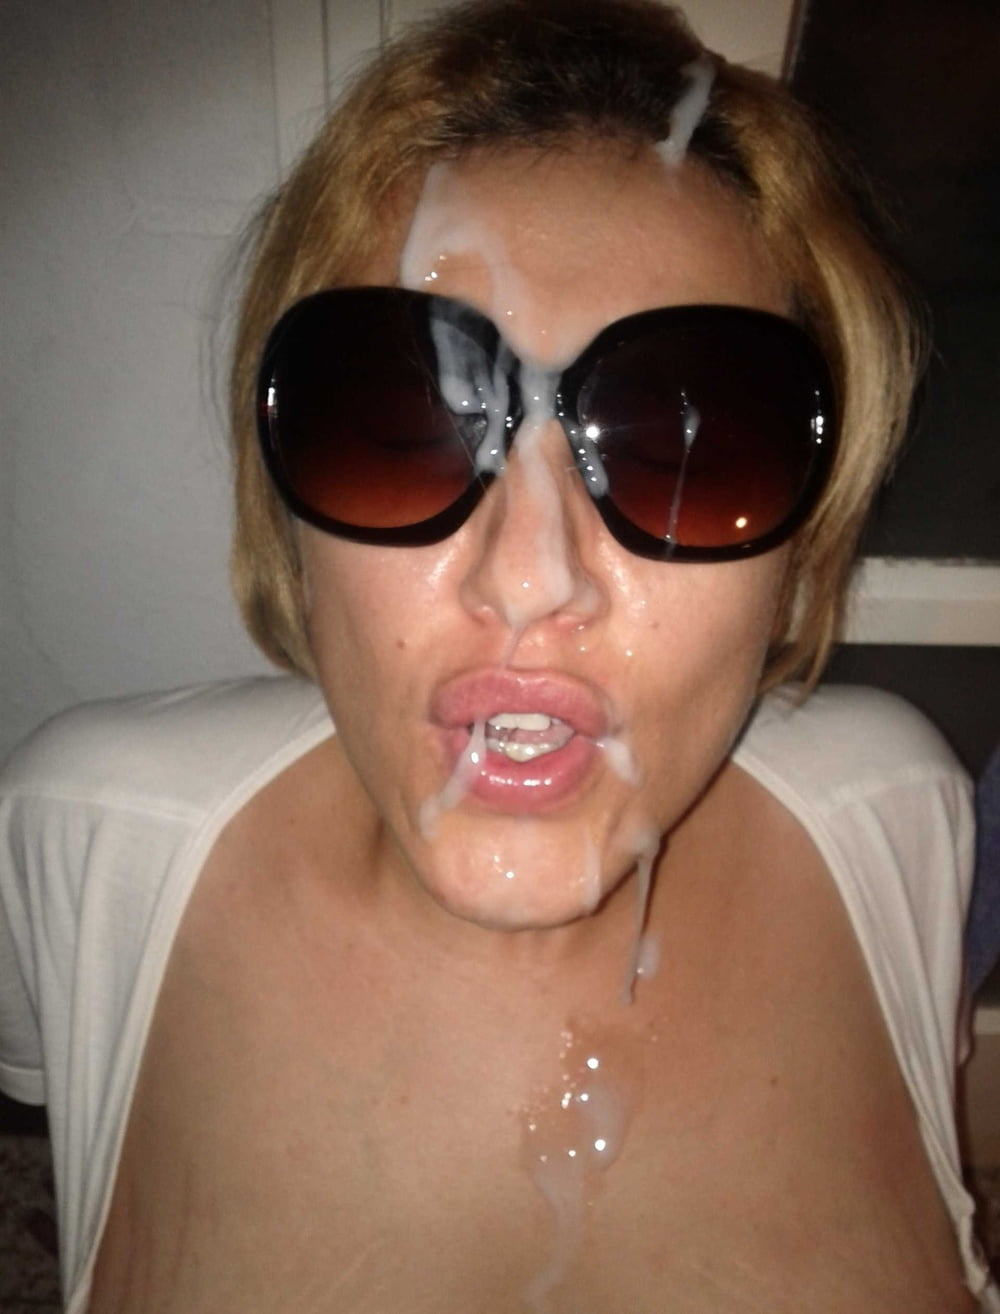 Pamela amateur facial, bikini pictures of vida guerra